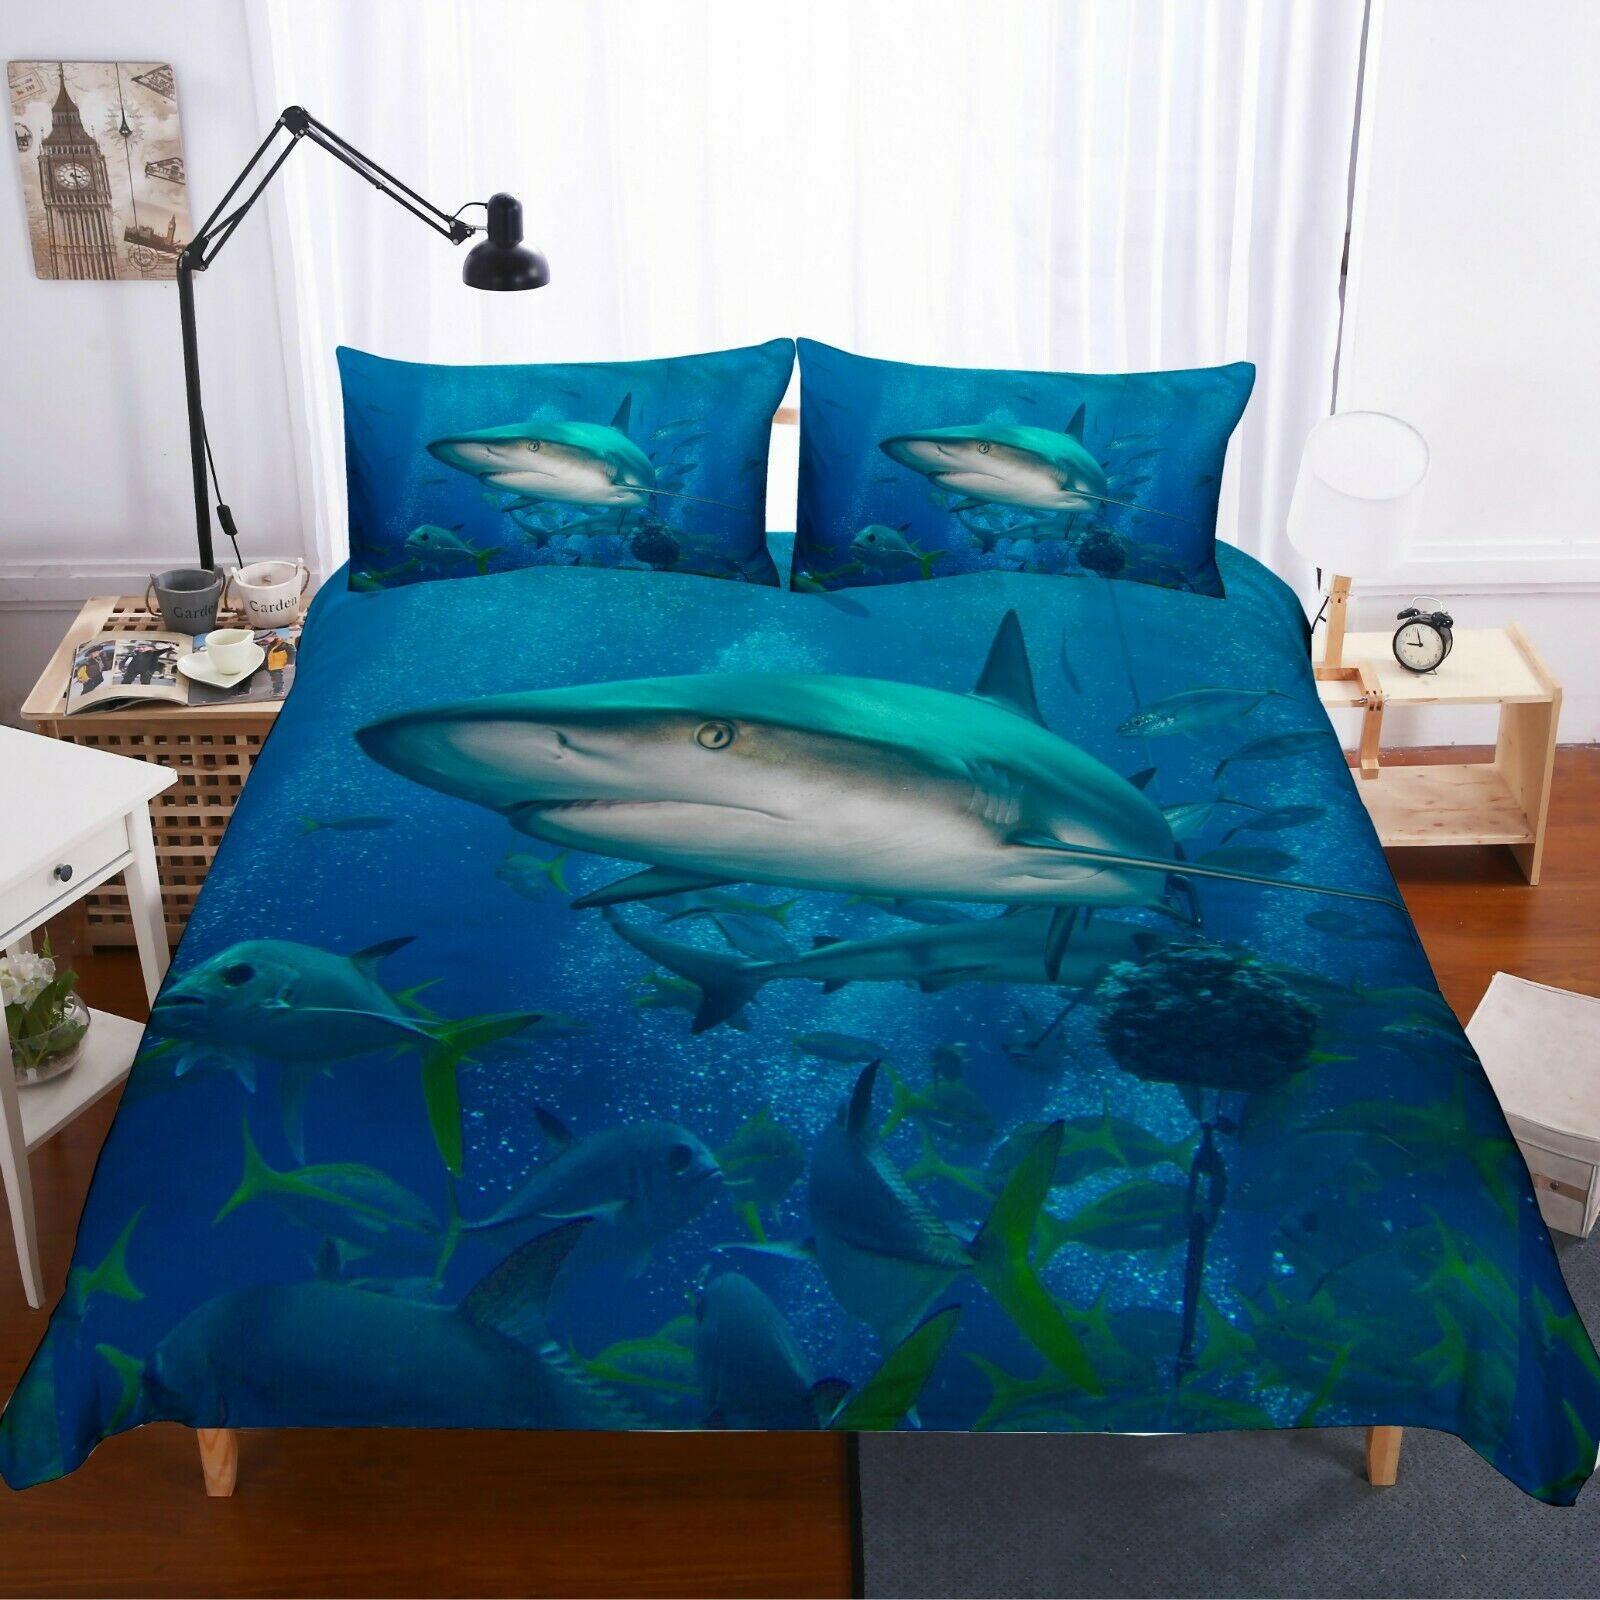 3D bluee Sharks Quilt Cover Set Bedding Duvet Cover Single Queen King 3pcs 20